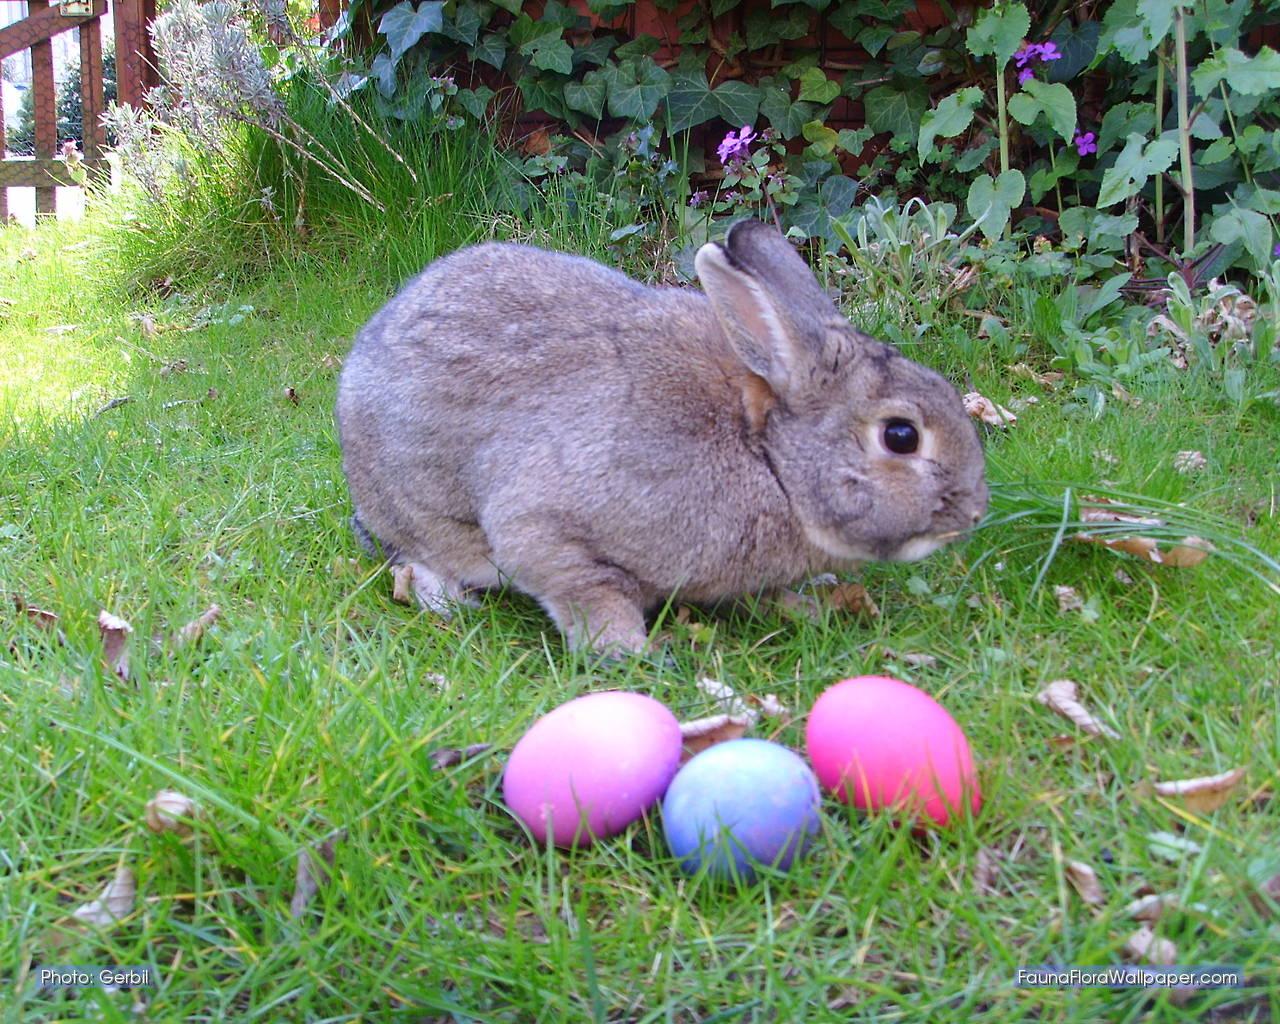 Funny Wallpaper Desktop: Easter Bunny Clip Art Pictures